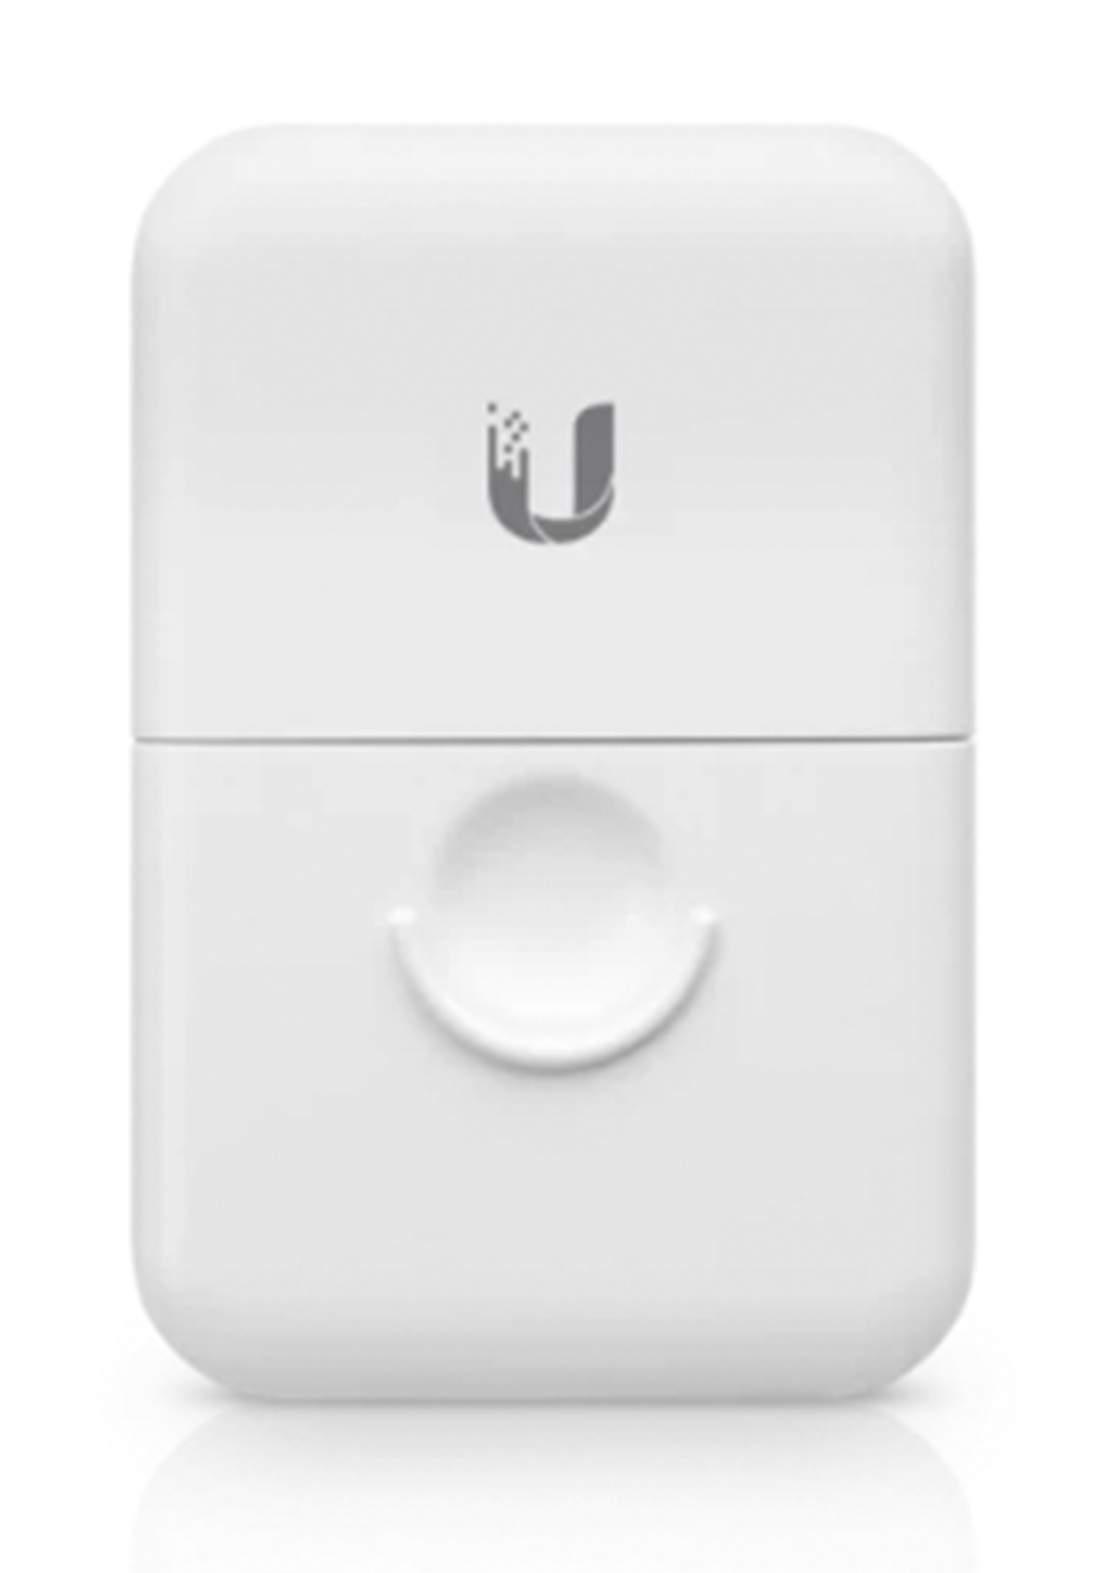 Ubiquiti ETH-SP-G2 Ethernet Surge Protector - White